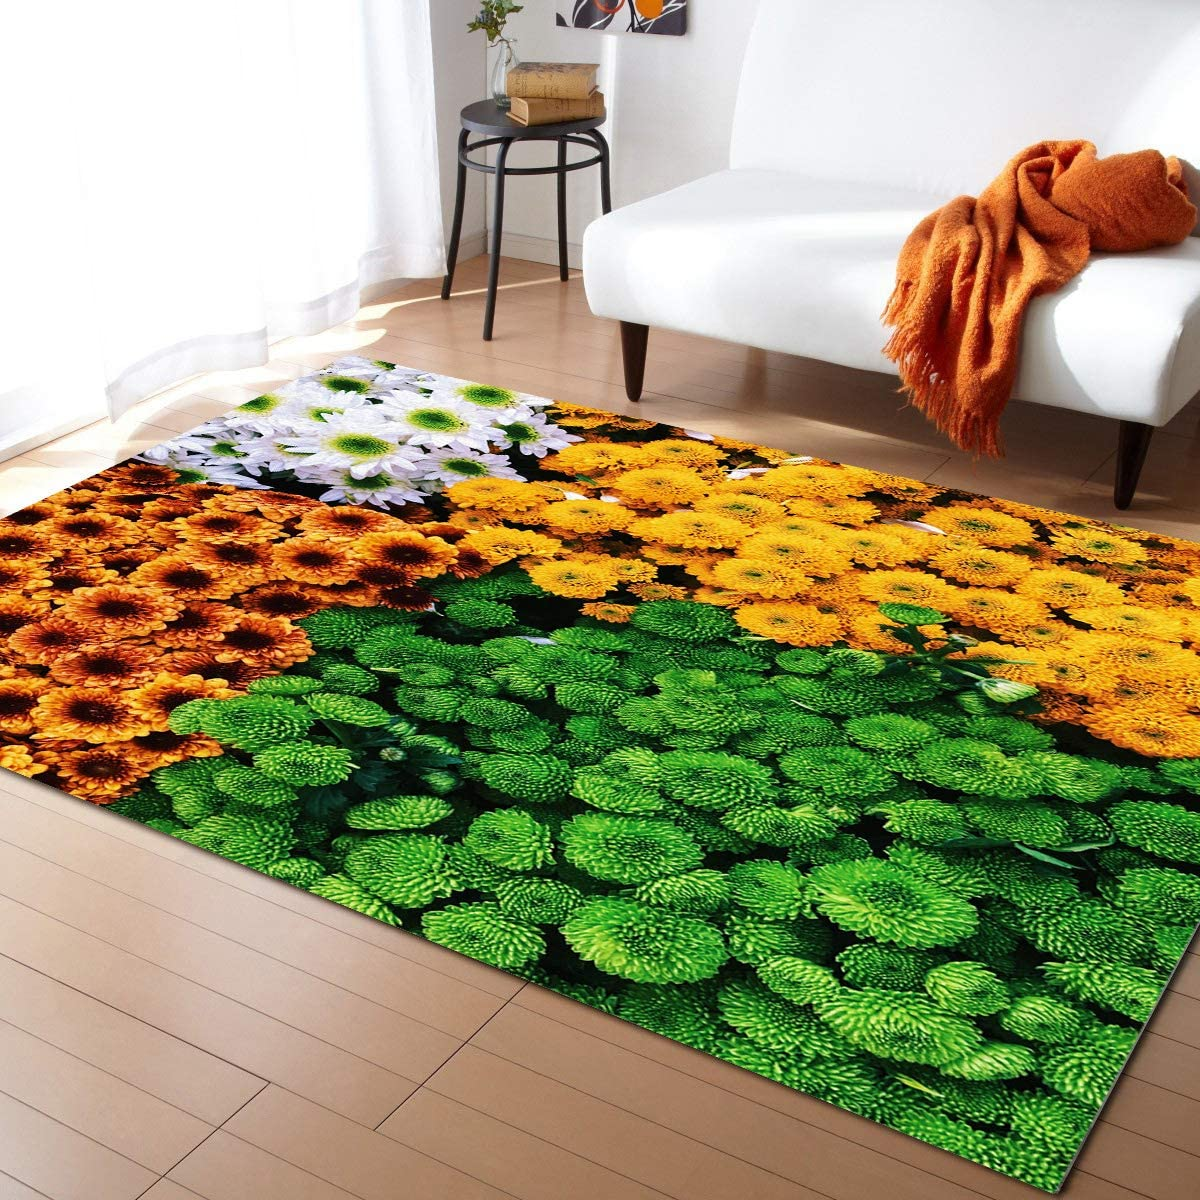 Area Rugs Non Slip Indoor Spring San Antonio Mall Floor Super beauty product restock quality top Flower Chrysanthe Carpet